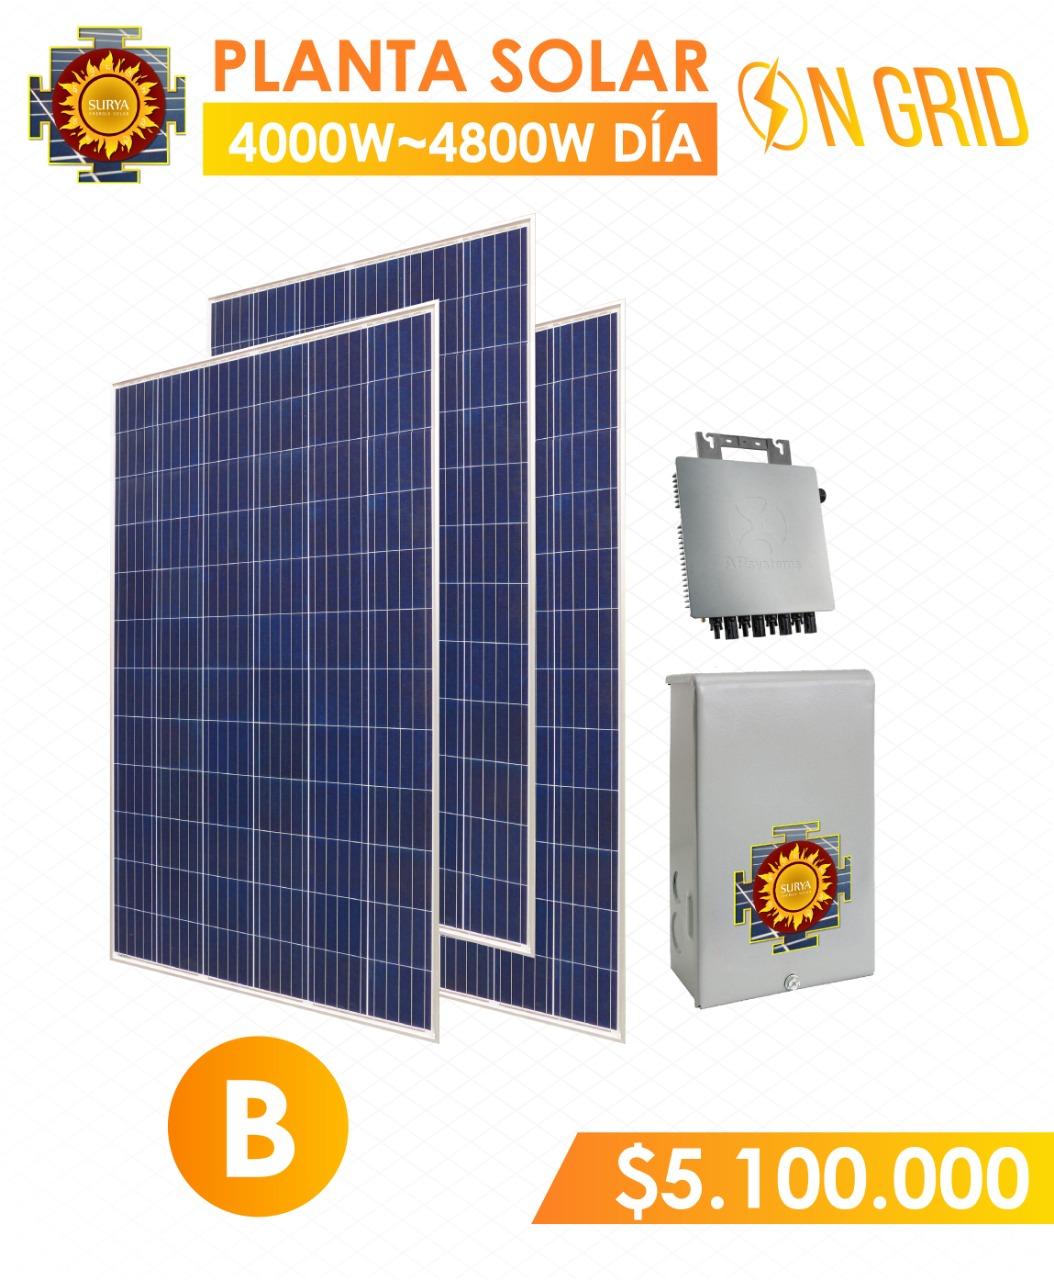 planta solar inyeccion a la red 4000 watts a 4800watts al dia